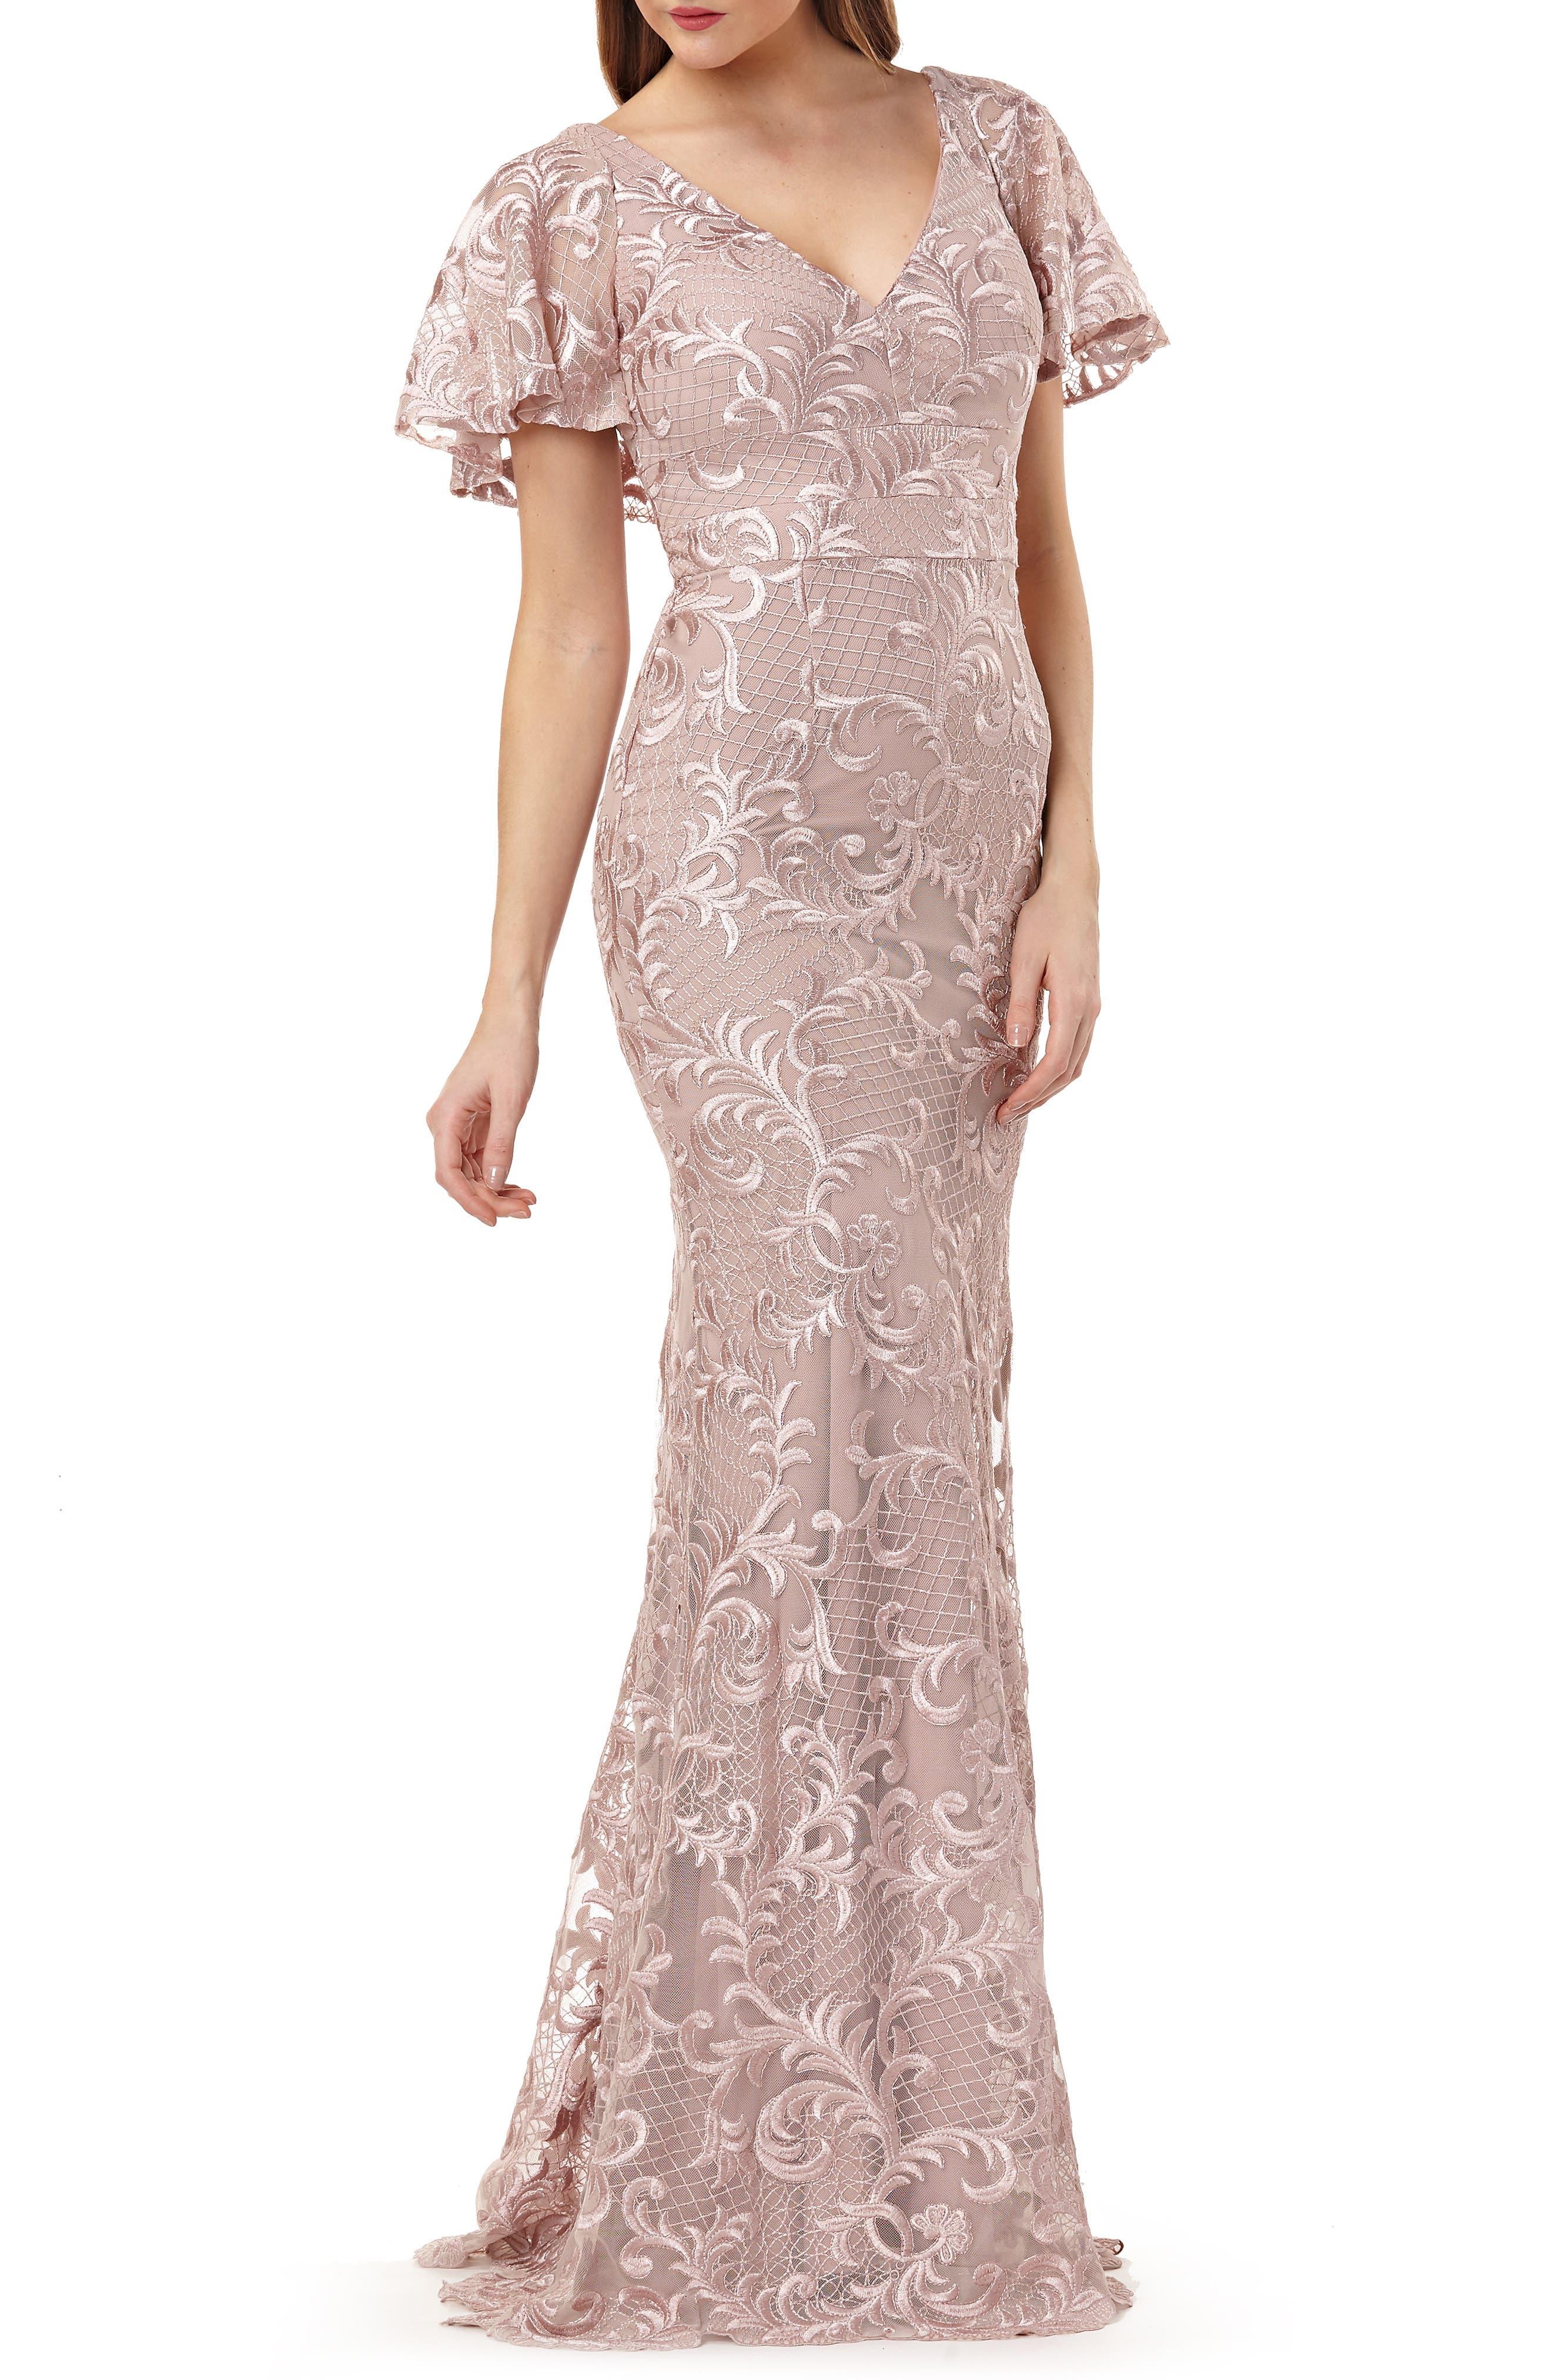 1930s Evening Dresses | Old Hollywood Dress Womens Carmen Marc Valvo Infusion Capelet Sleeve Evening Dress Size 16 - Pink $448.00 AT vintagedancer.com